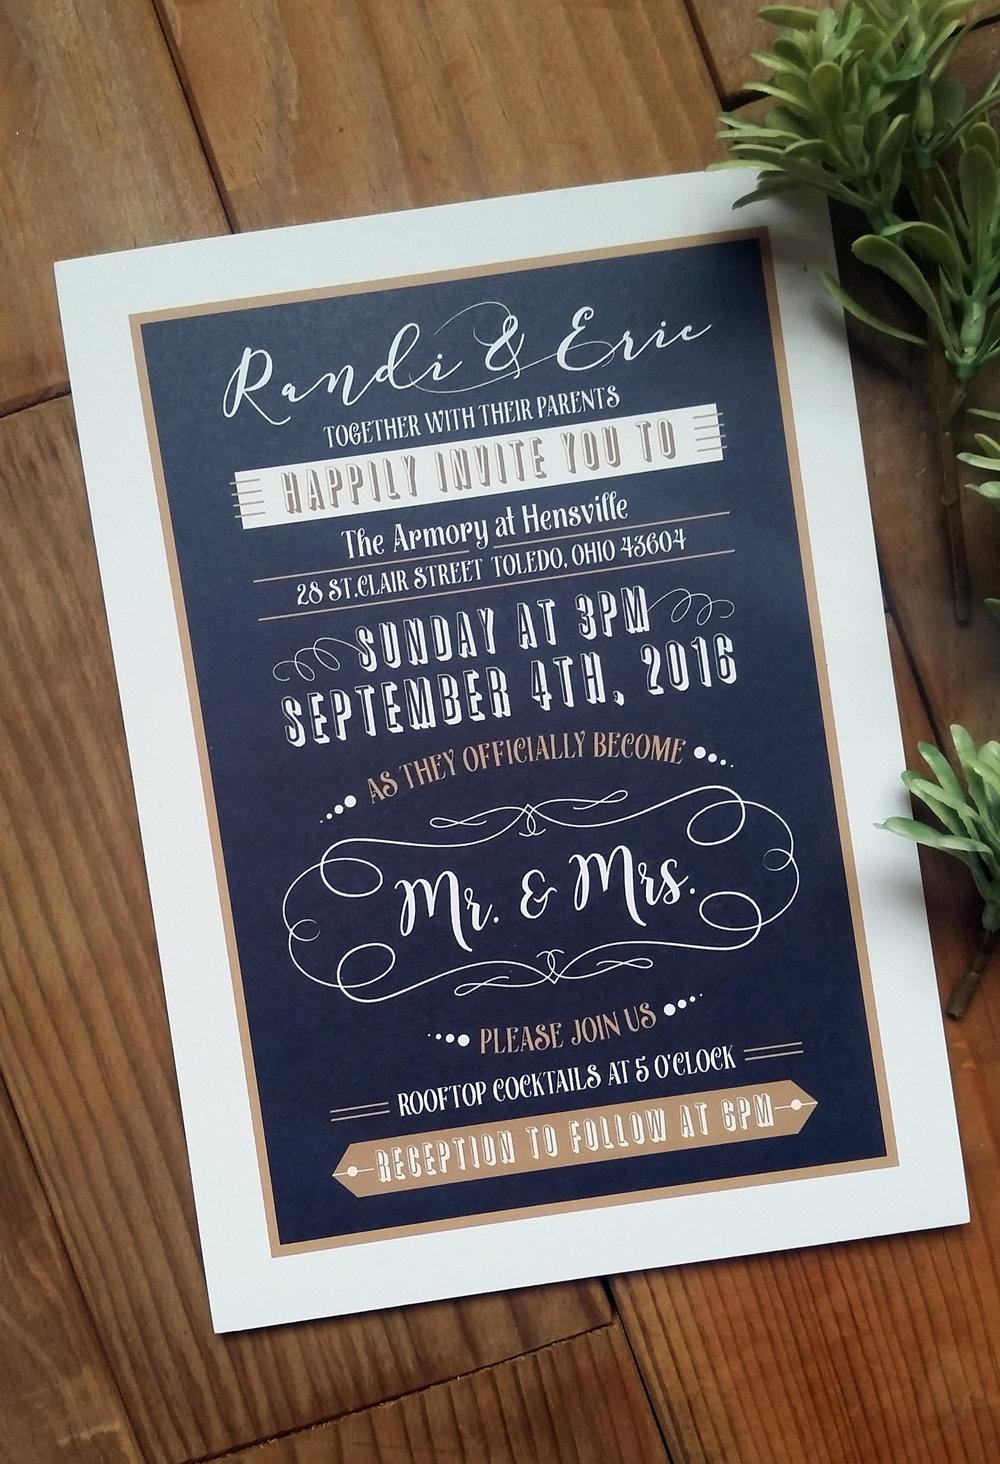 Mr. & Mrs. Wedding Invitation_1.jpg